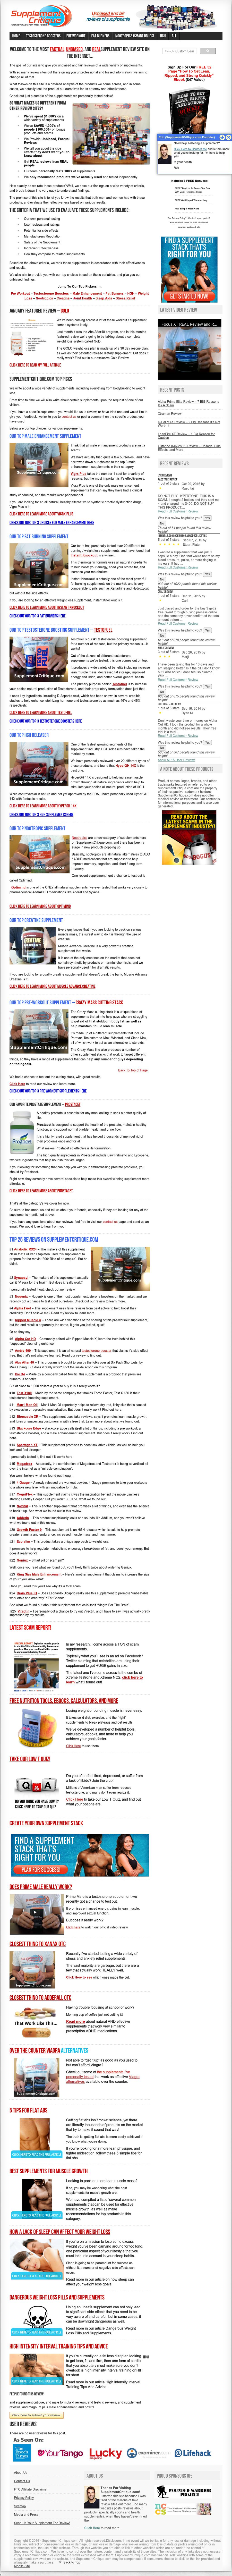 Owler Reports - Press Release: SupplementCritique : Supplement